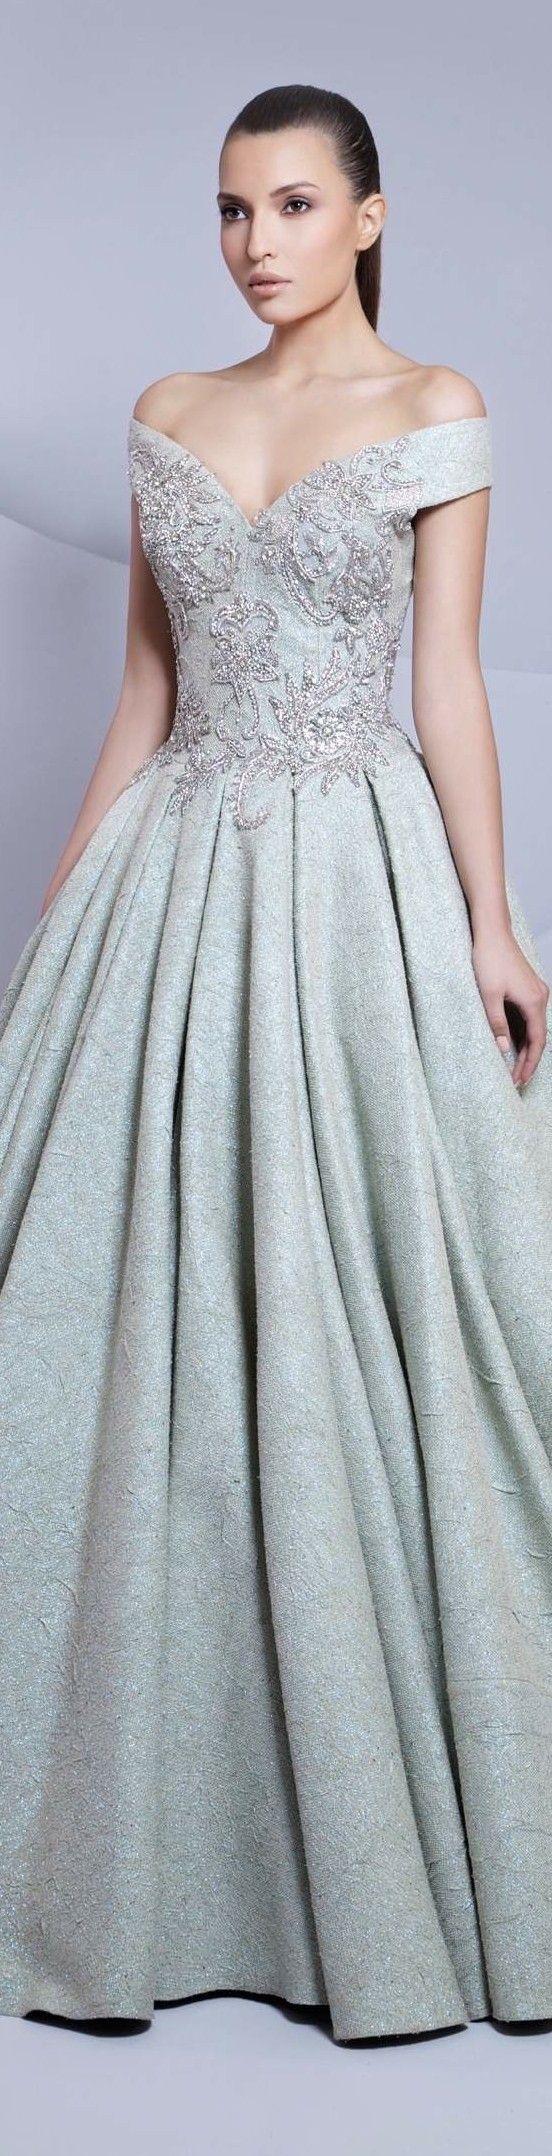 Tarek sinno couture pale blue wedding bridal gown dress